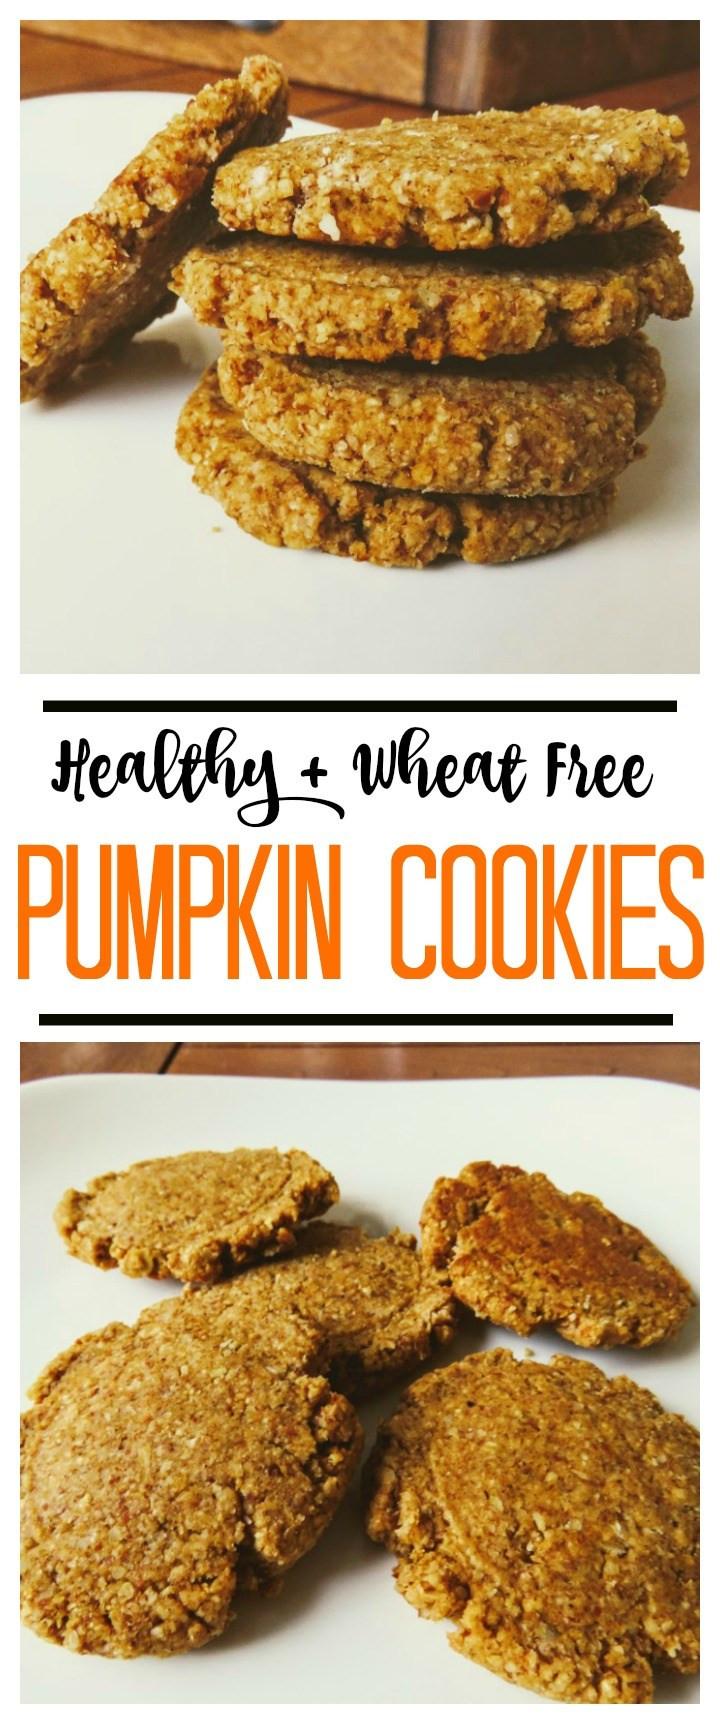 Healthy Pumpkin Cookies  Healthy Wheat Free Pumpkin Cookies Write Your Story